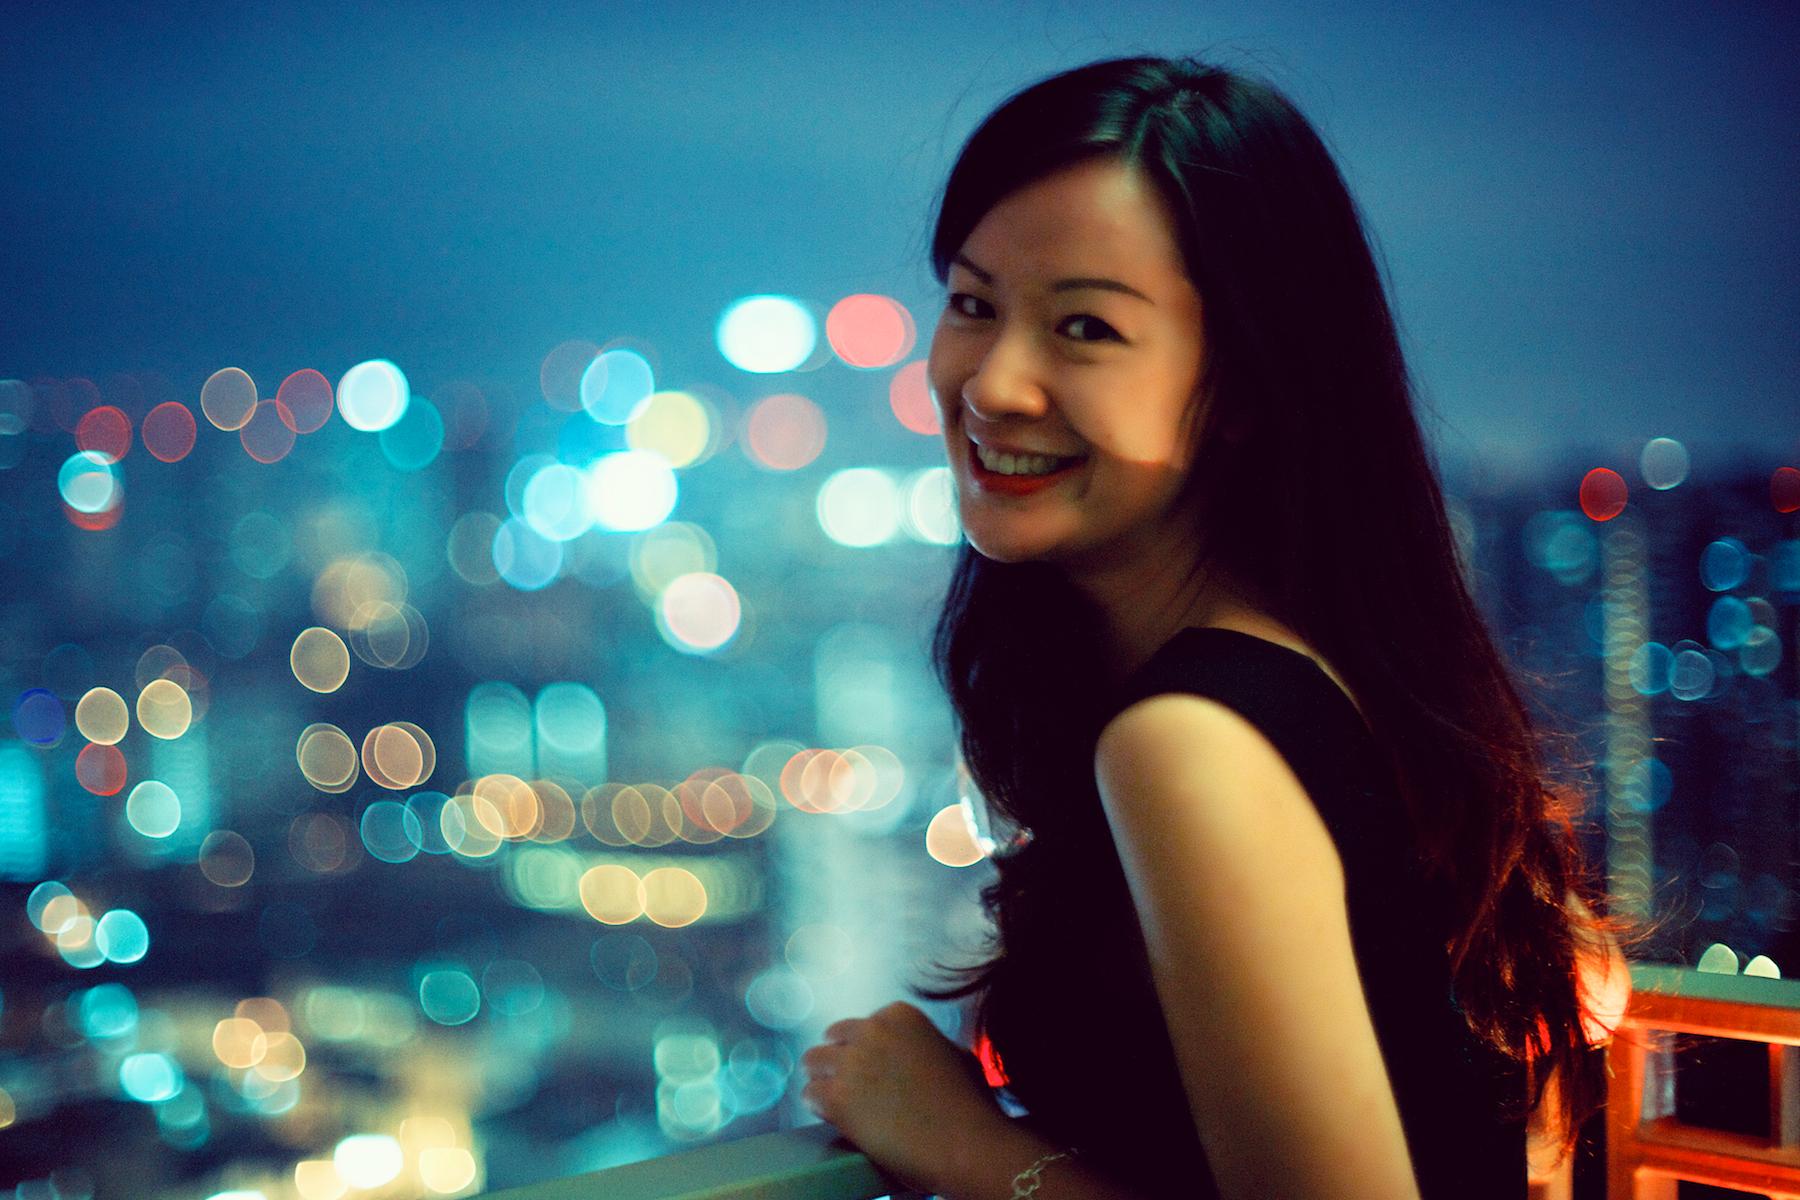 portrait woman girl beautiful smiling skyline night 50mm lowlight Nikon Singapore bokeh nikkor F12 nikkor50mmf12 nikkor50mmf12ais  sc 1 th 183 & Wallpaper : portrait woman girl beautiful smiling skyline ...